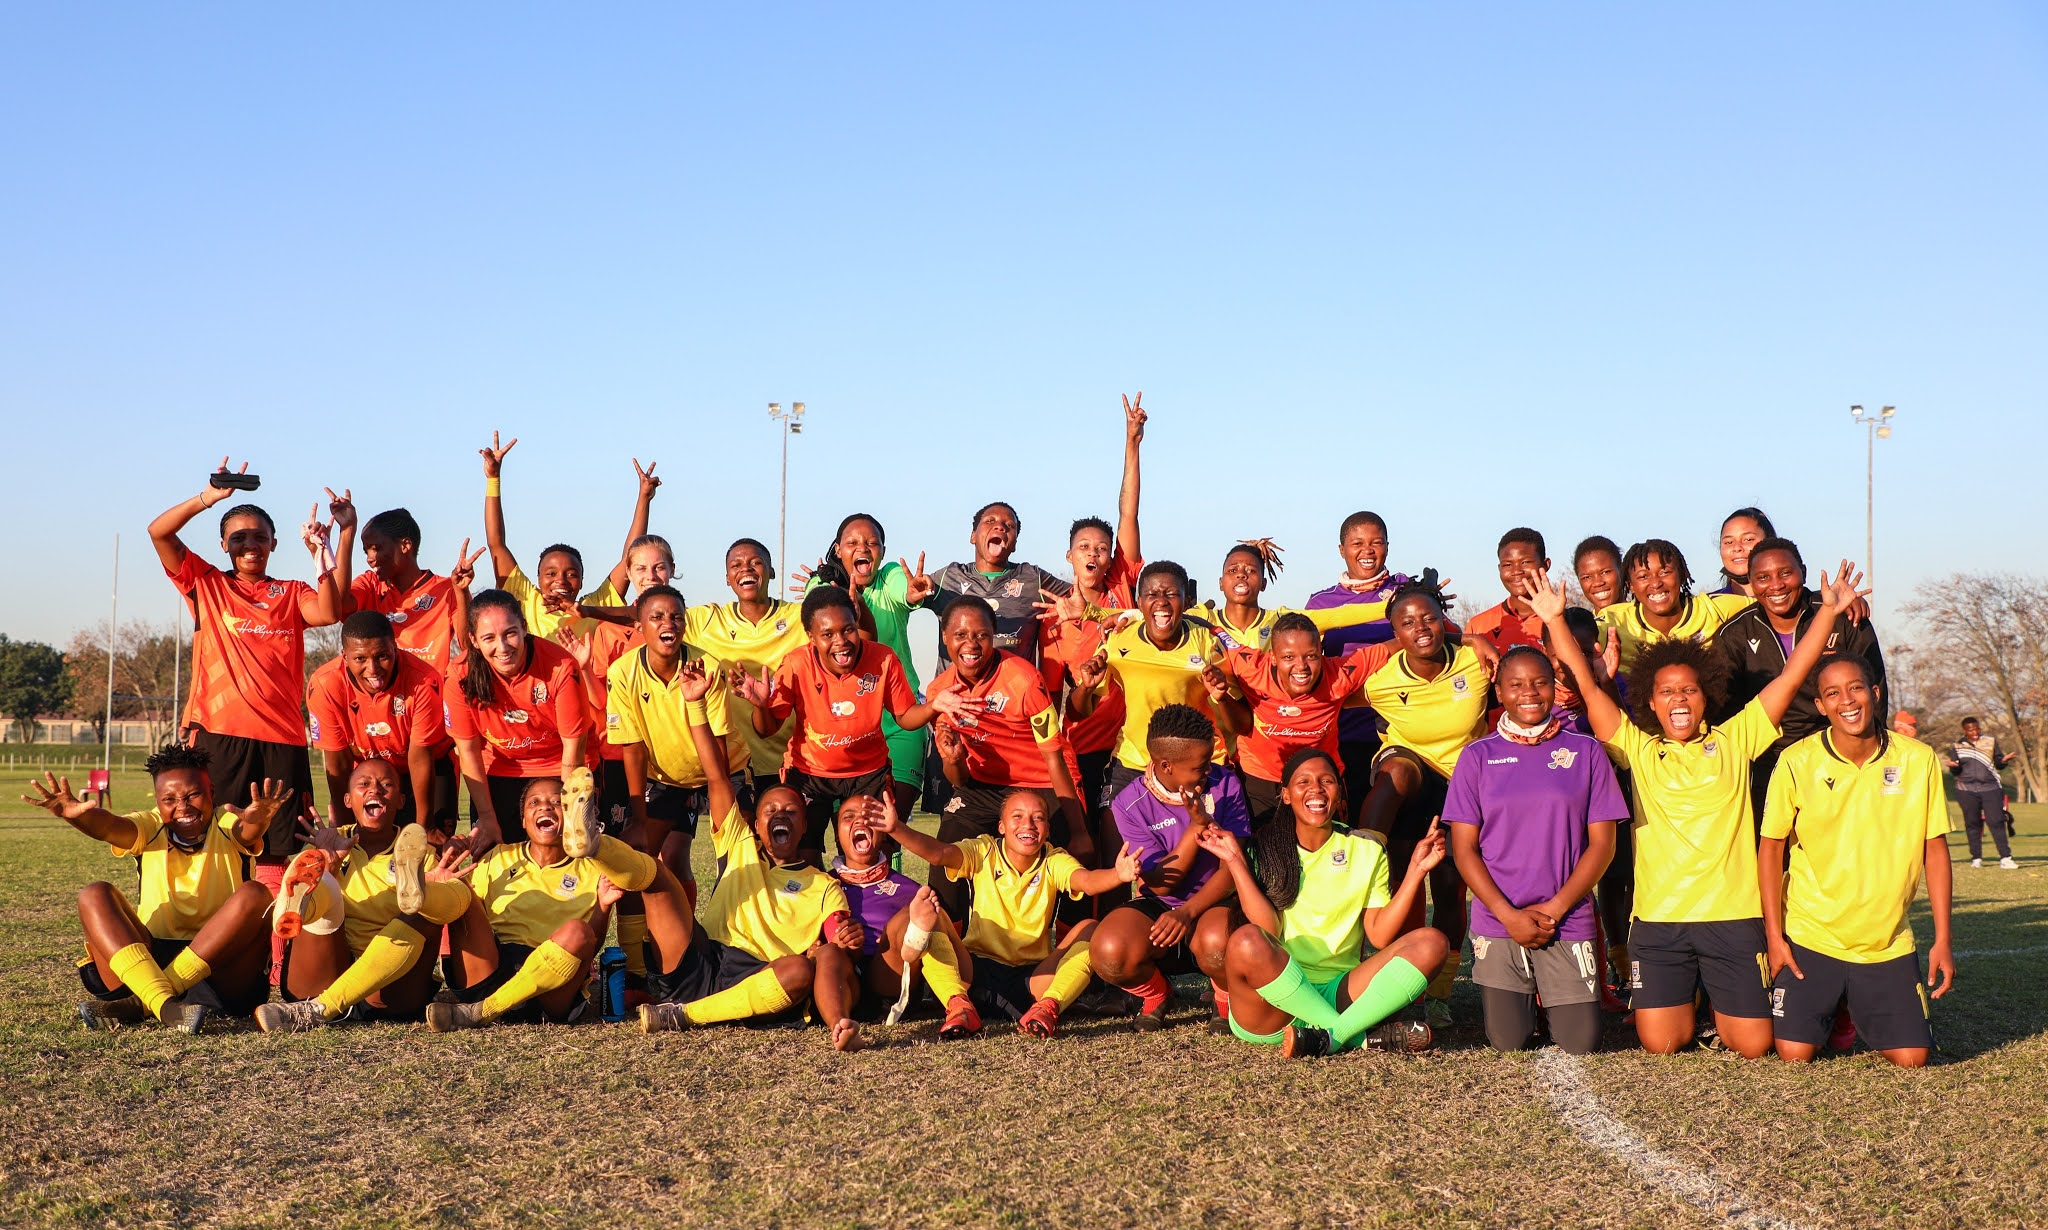 UWC Ladies and University of JHB Ladies displaying excellent sportsmanship after last week's intense encounter